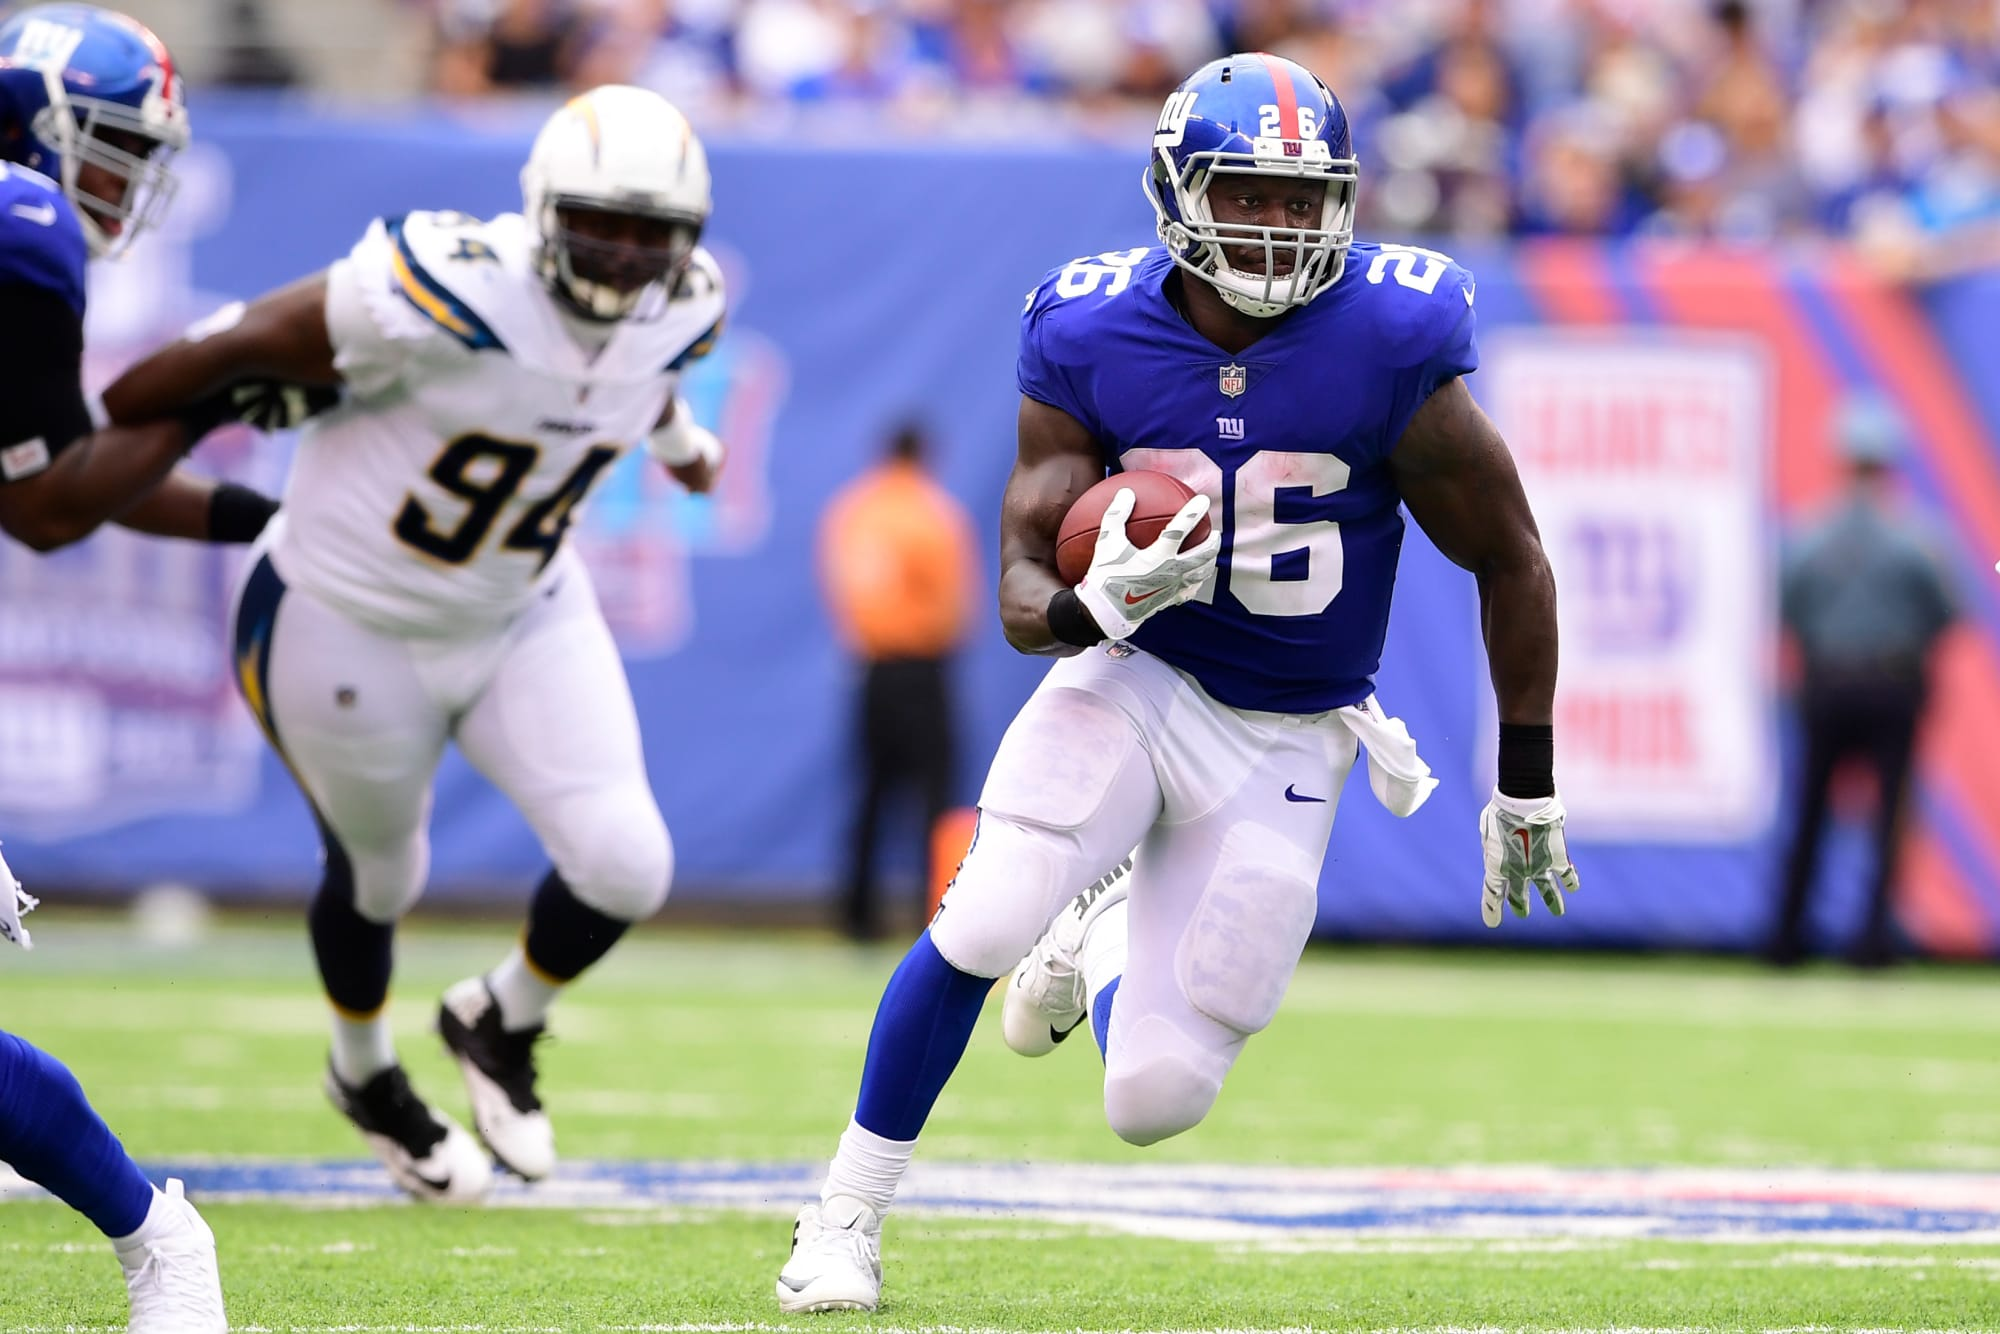 New York Giants: Whatever happened to Orleans Darkwa?